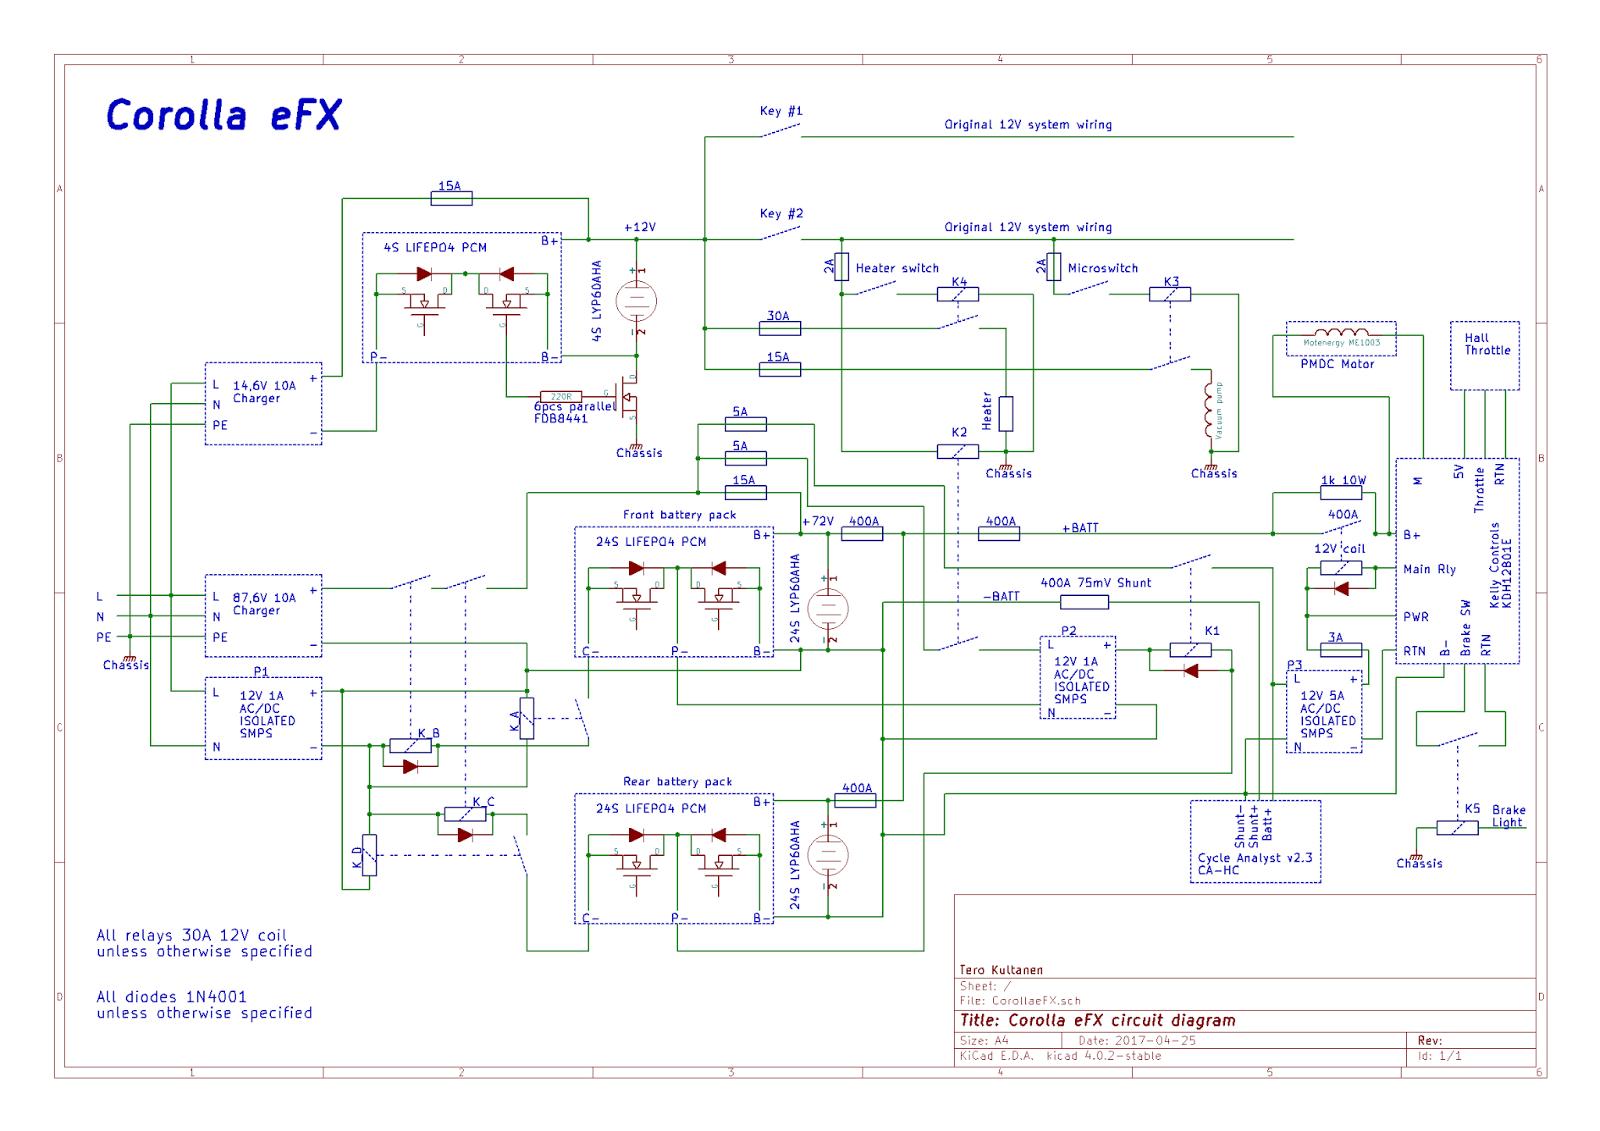 hight resolution of circuit diagram update 25 4 2017